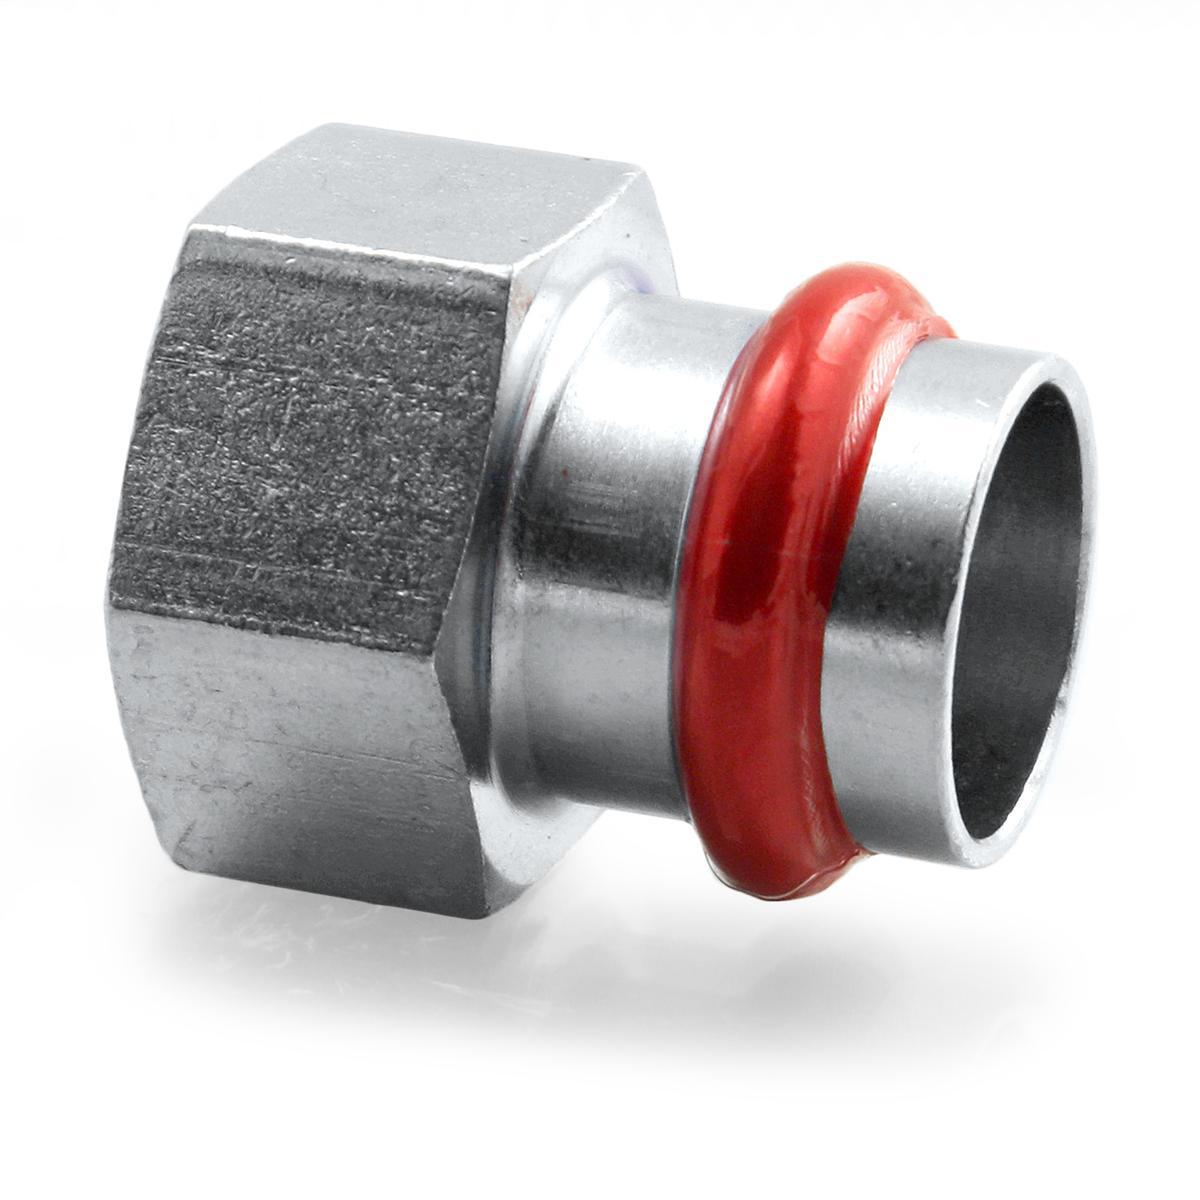 Press Steel Straight Female 3/4Fx15